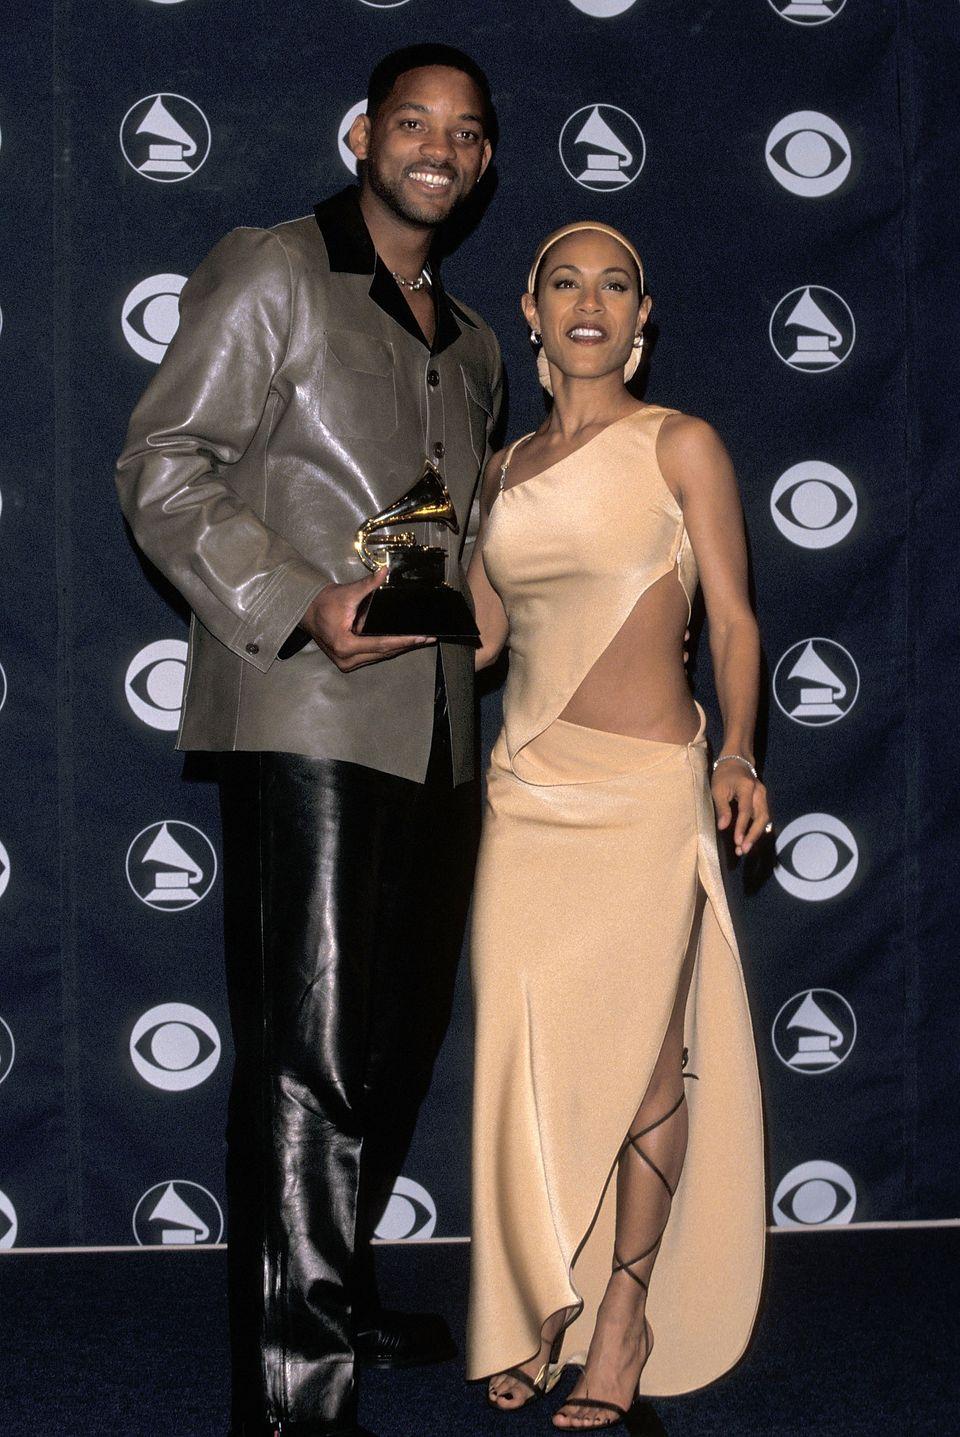 The 1999 Grammy Awards: A Flashback To Wonderfully '90s